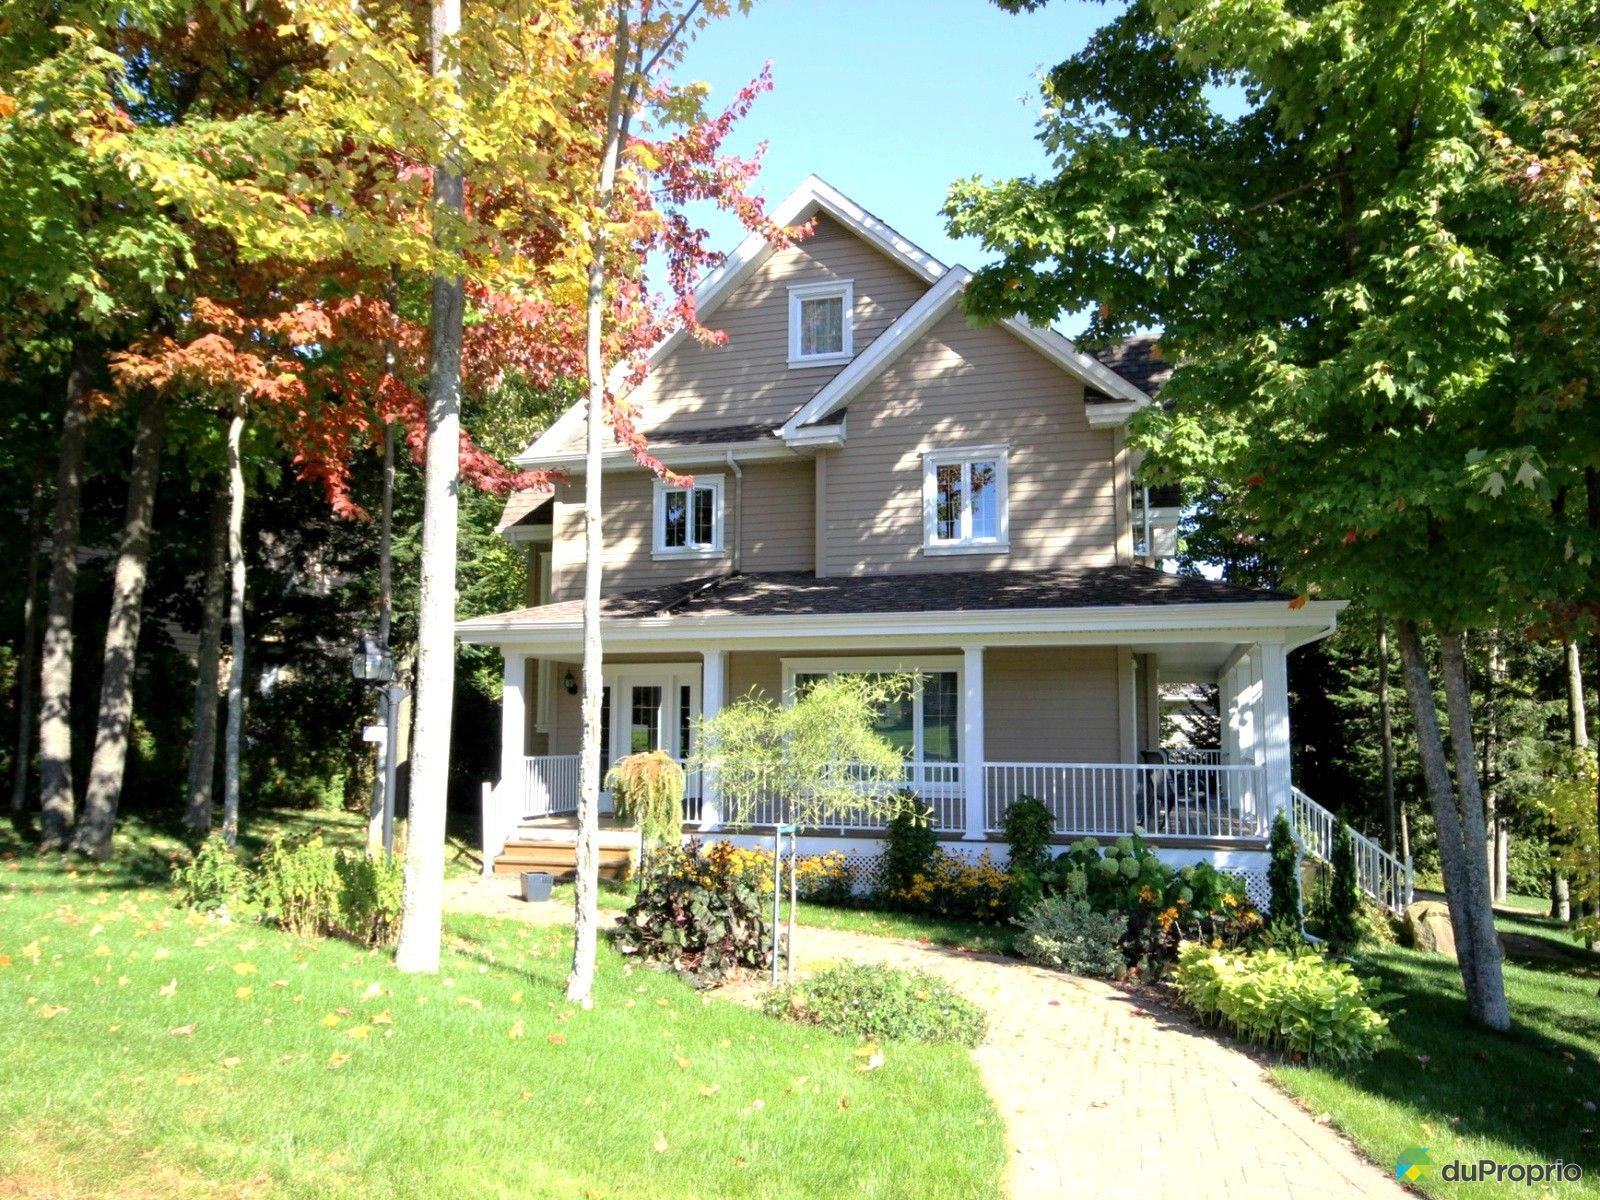 maison vendre rock forest 4869 rue viau immobilier. Black Bedroom Furniture Sets. Home Design Ideas